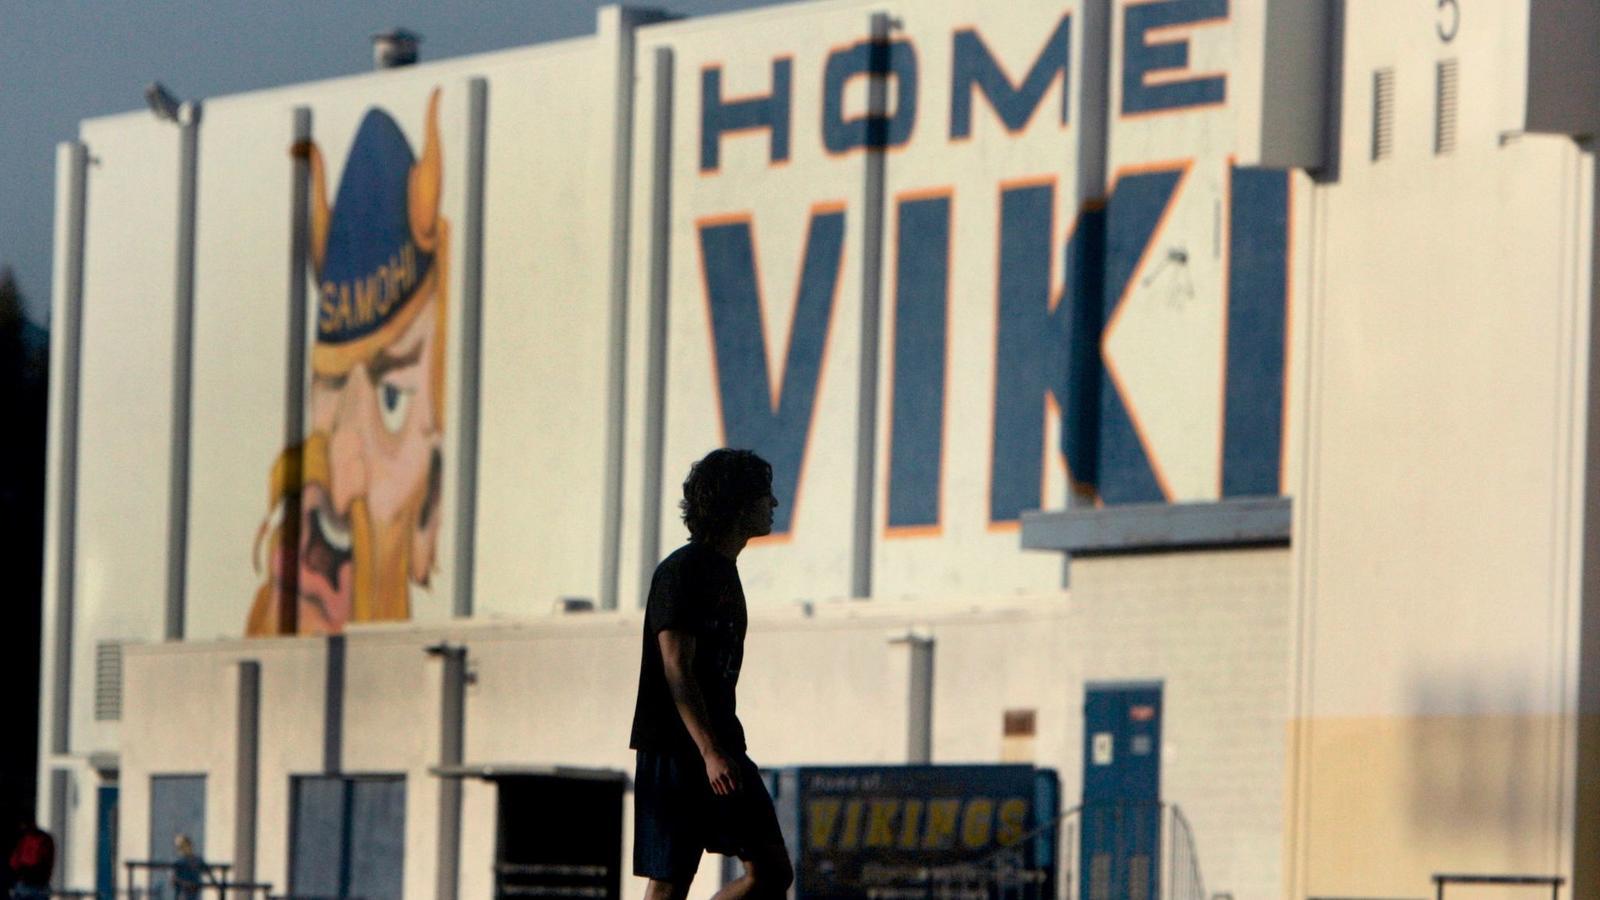 Santa Monica High School (Karen Tapia-Andersen / Los Angeles Times)